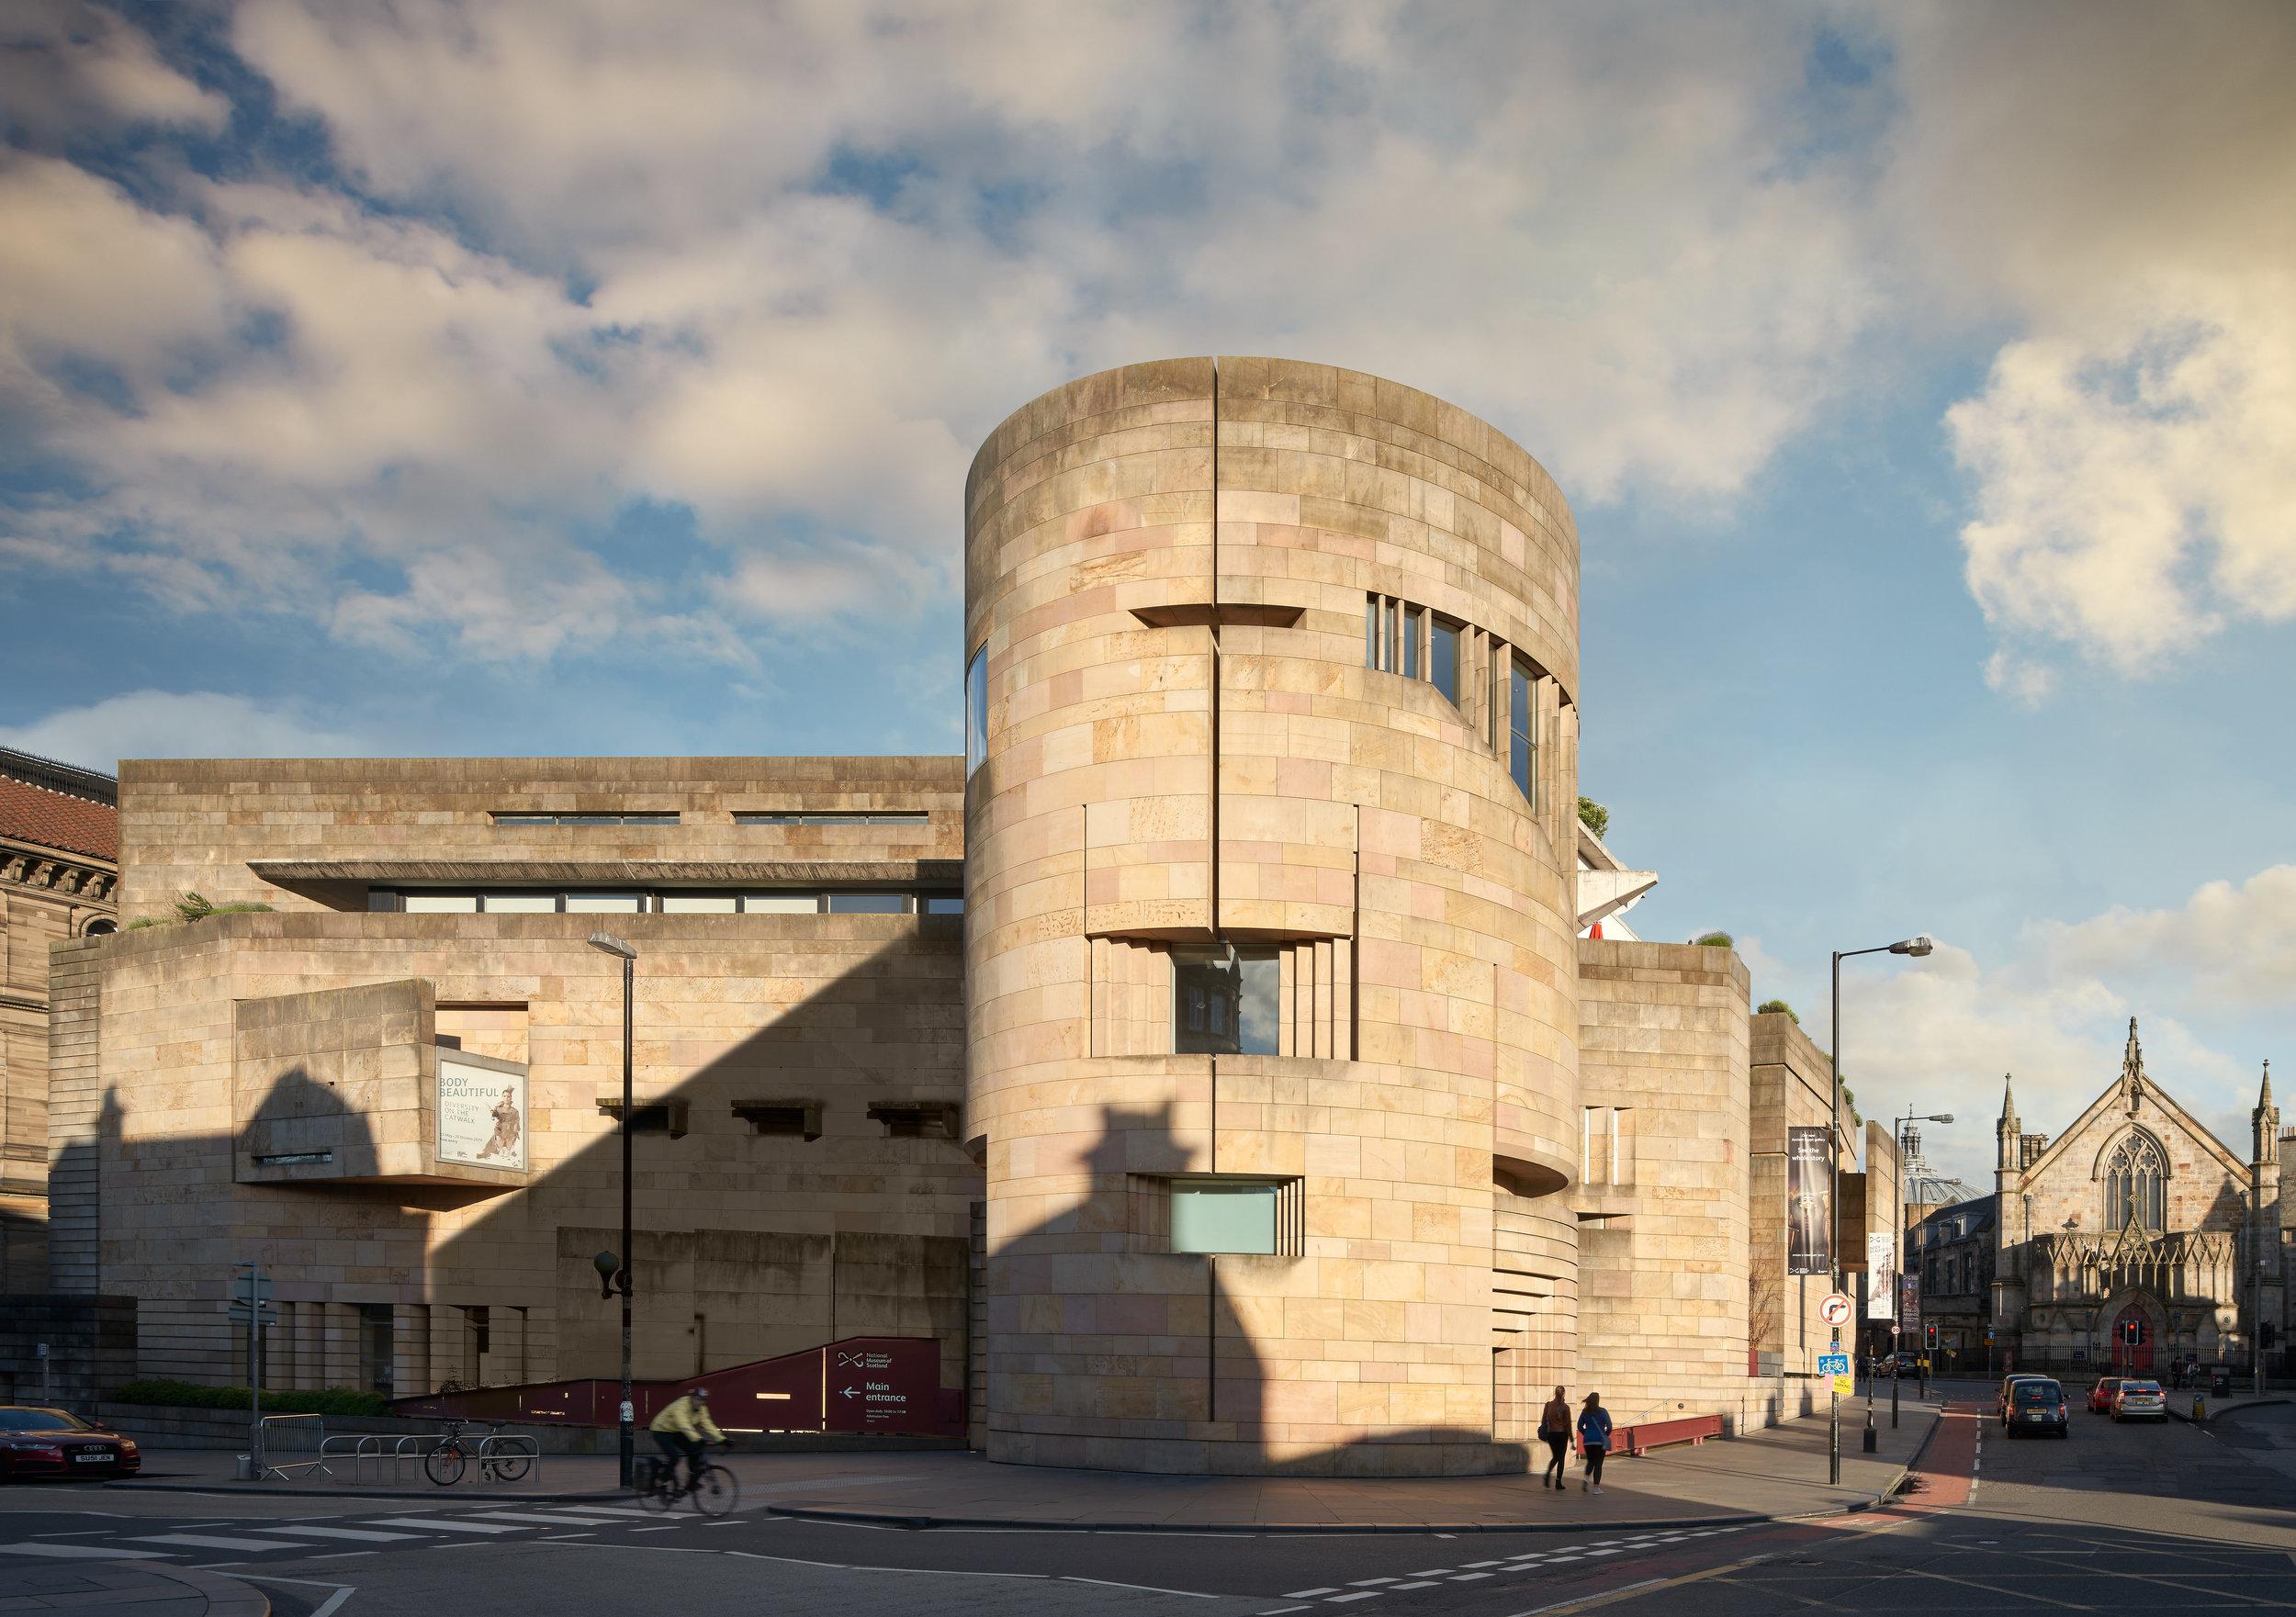 National Museum of Scotland: Edinburgh, U.K.